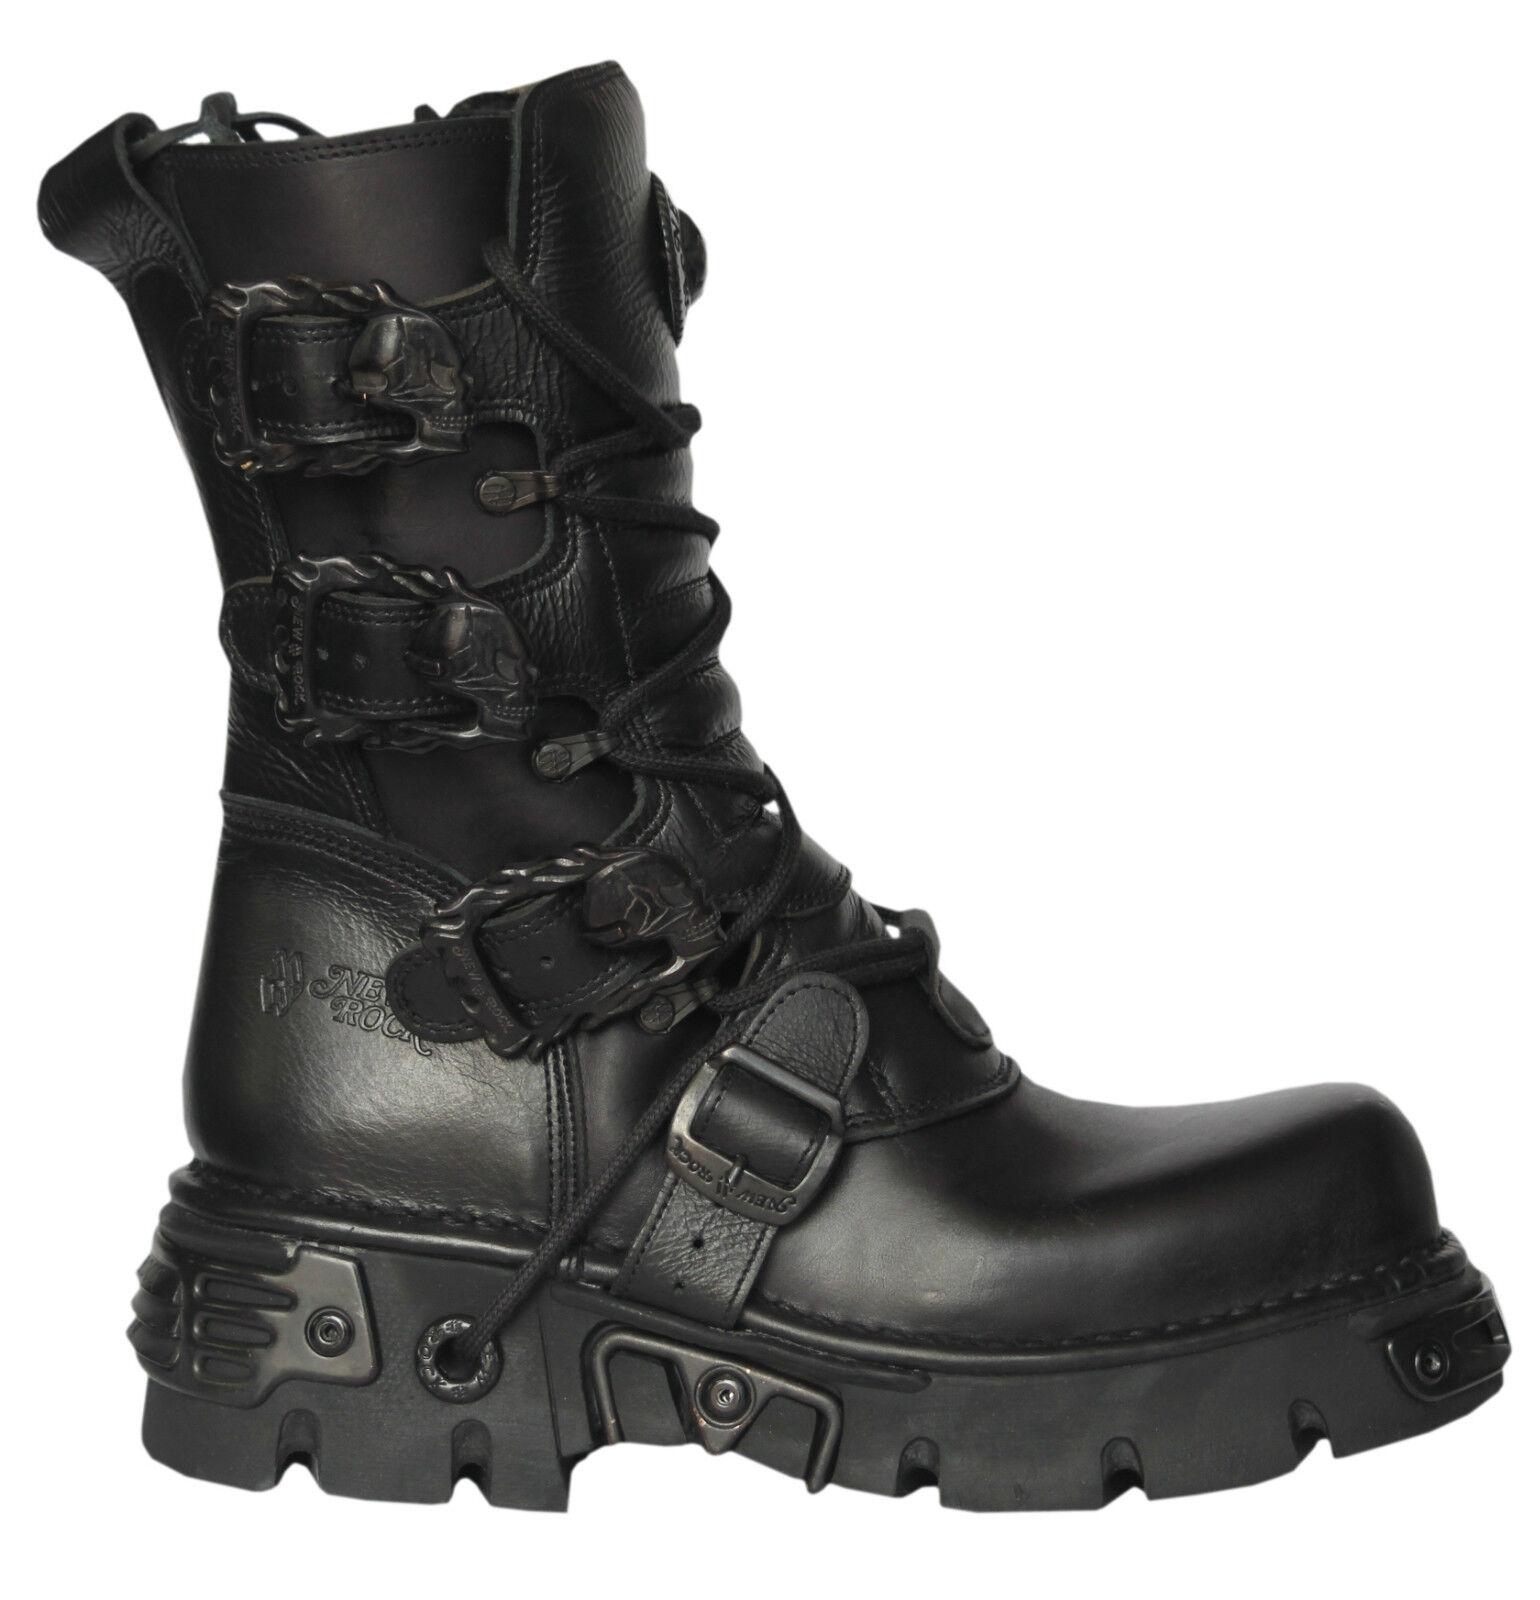 NEWROCK New Rock M.391-S18 Black Metallic Punk Reactor Goth Biker Unisex Boots